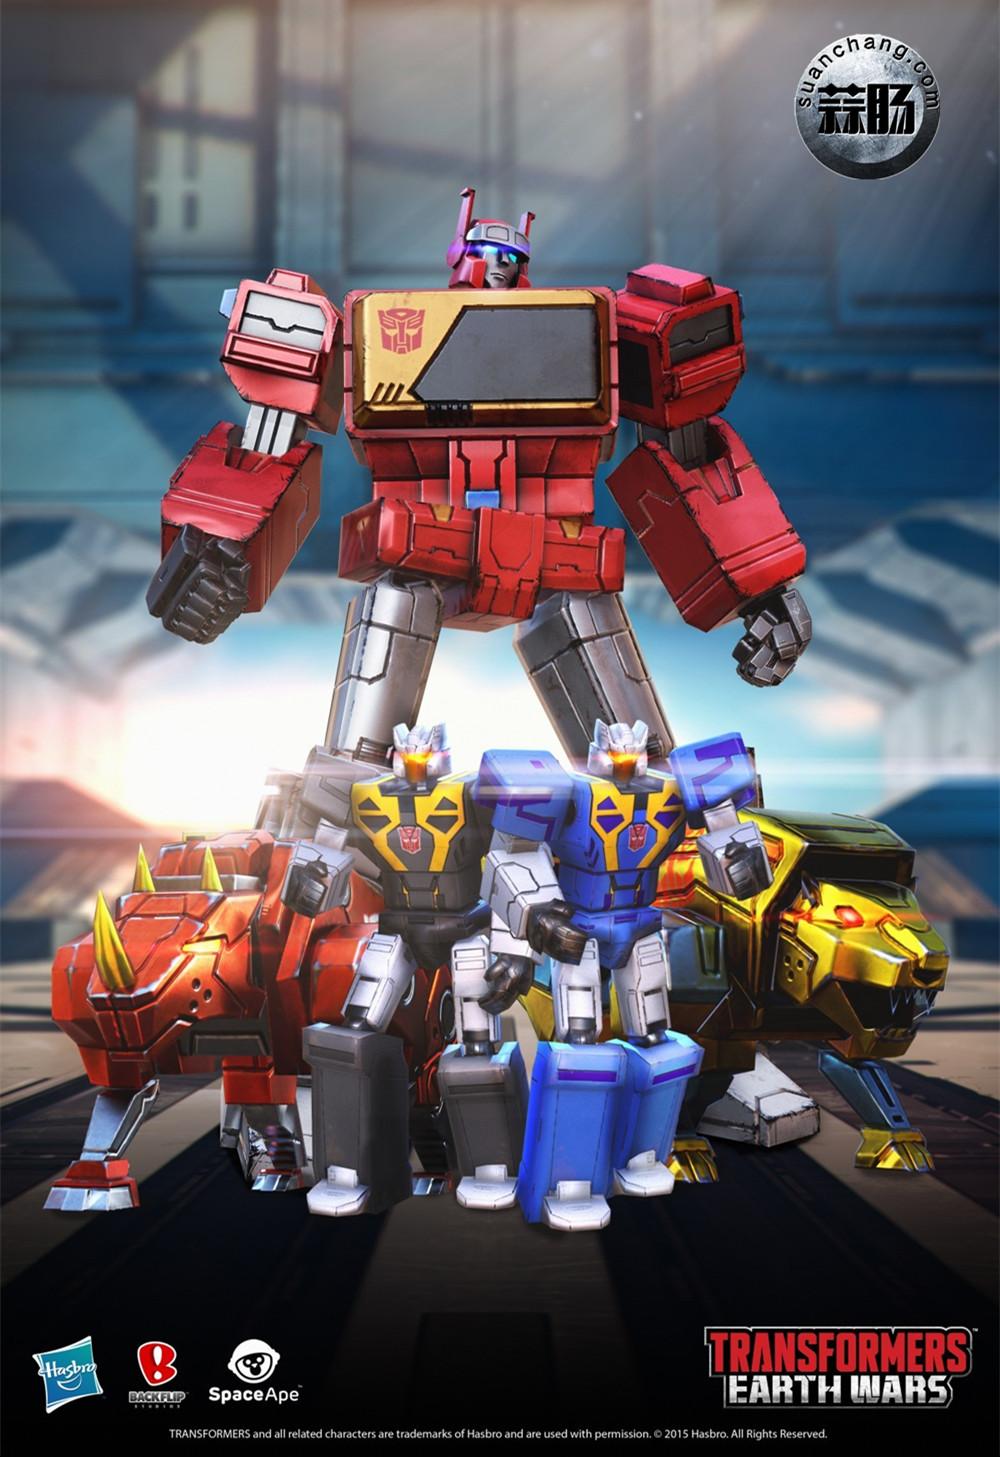 Transformers Earth Wars 游戏人物(一) 动态 第3张